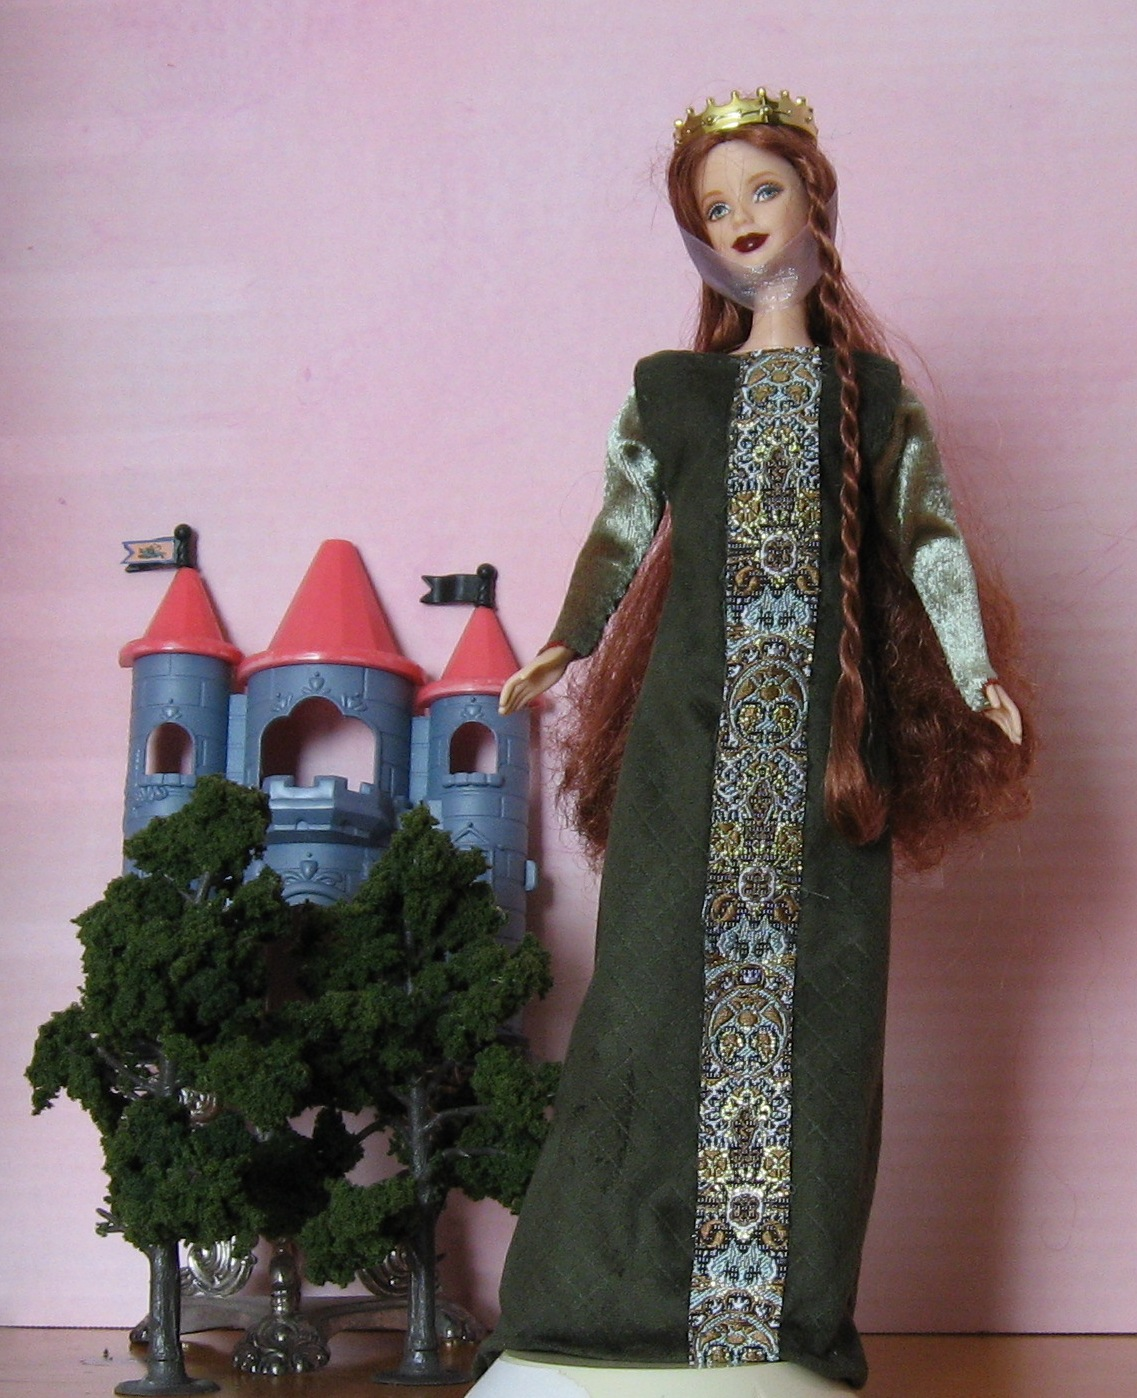 Eleanor of Aquitaine, View A   #0605   10.95